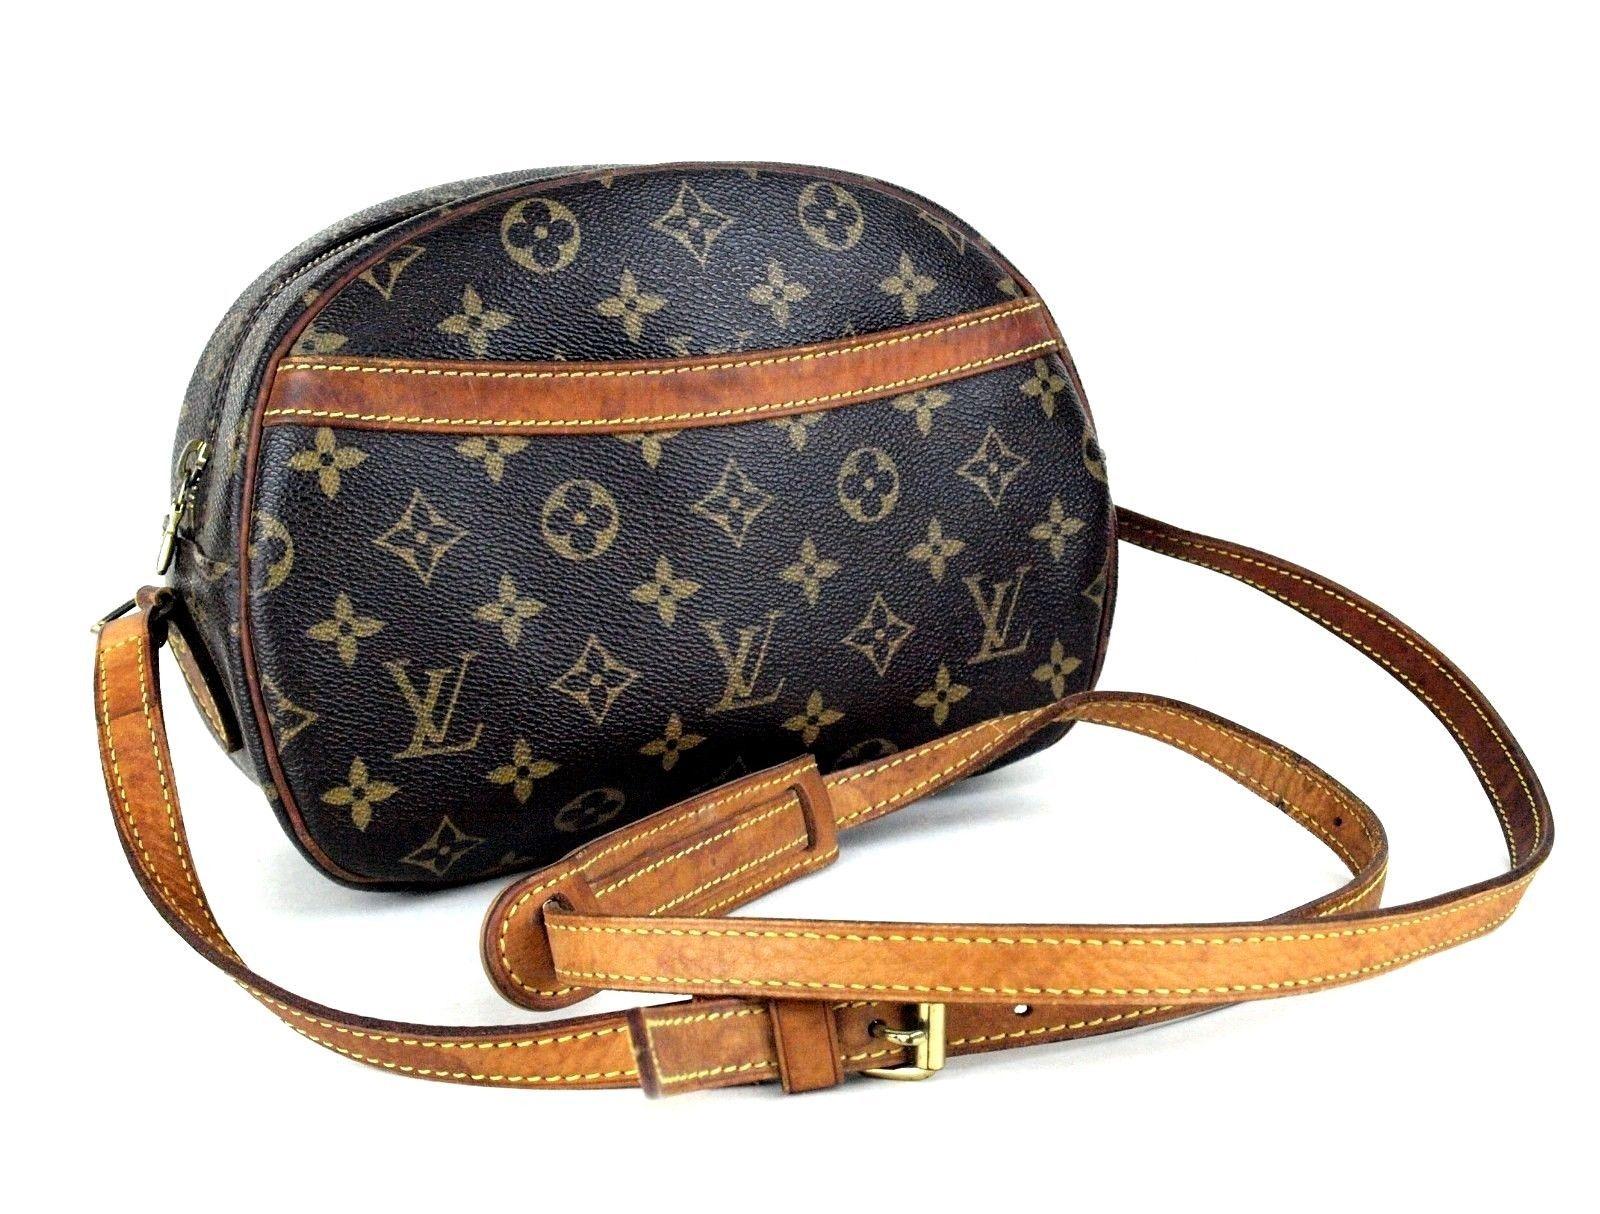 Auth Louis Vuitton Monogram Brown Leather Blois Crossbody Shoulder Bag SN1015 - $494.01